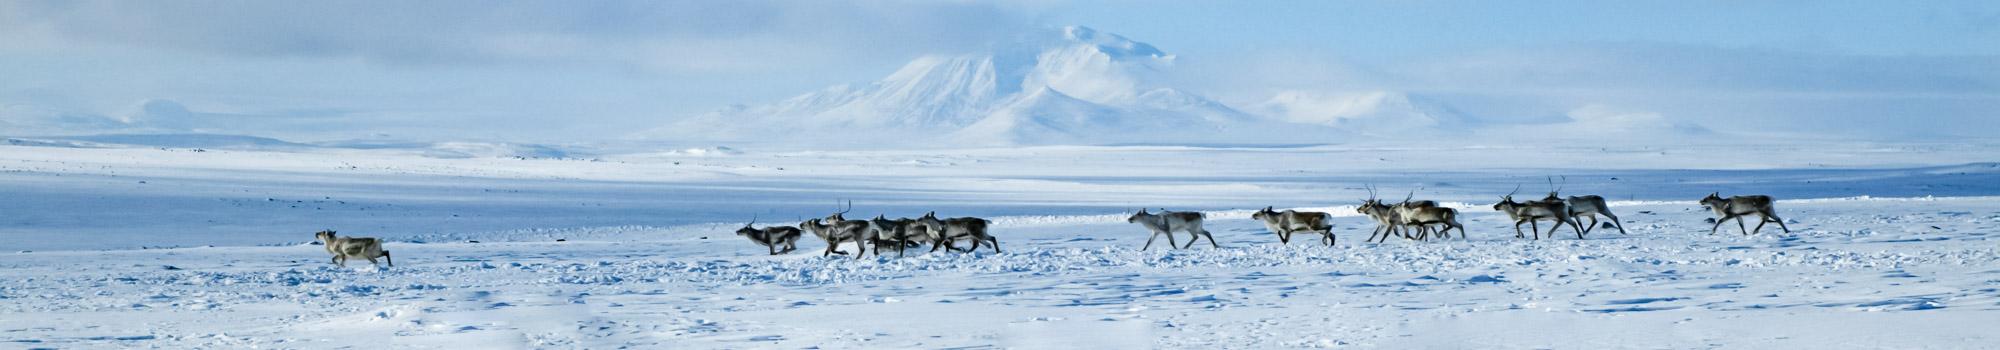 Reindeers running across fields in winter in Iceland